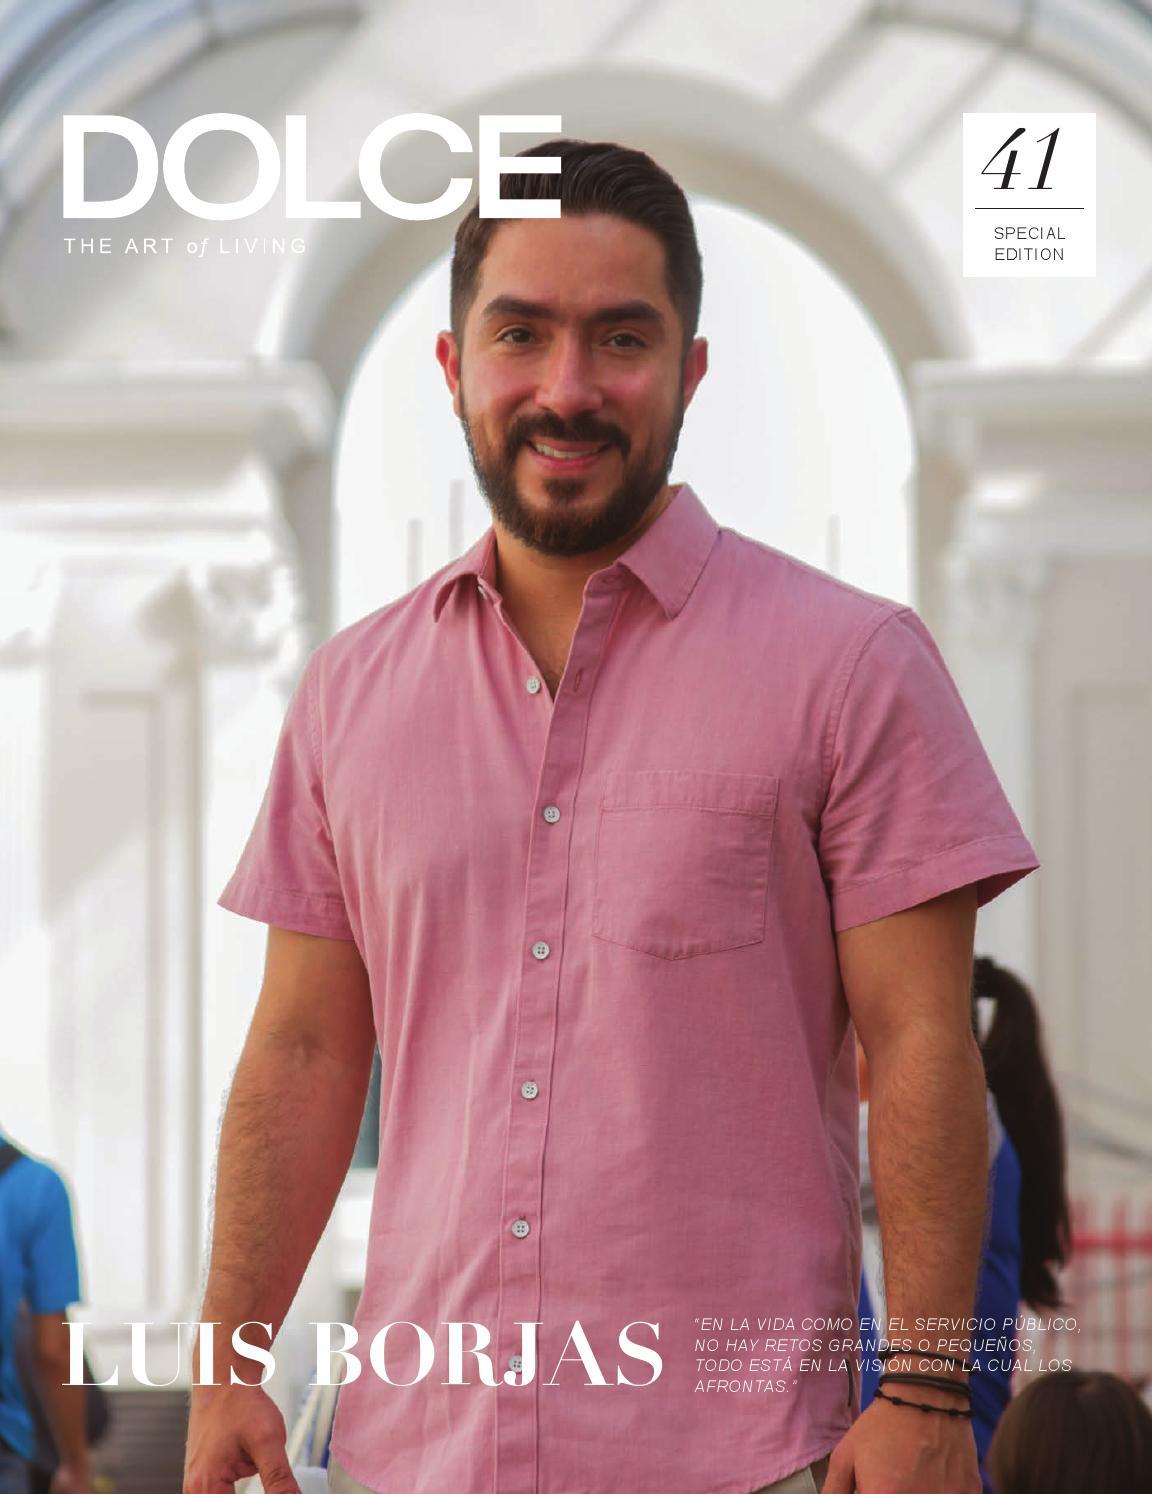 DOLCE Magazine No.41 / 2015 by Dolce magazine - issuu